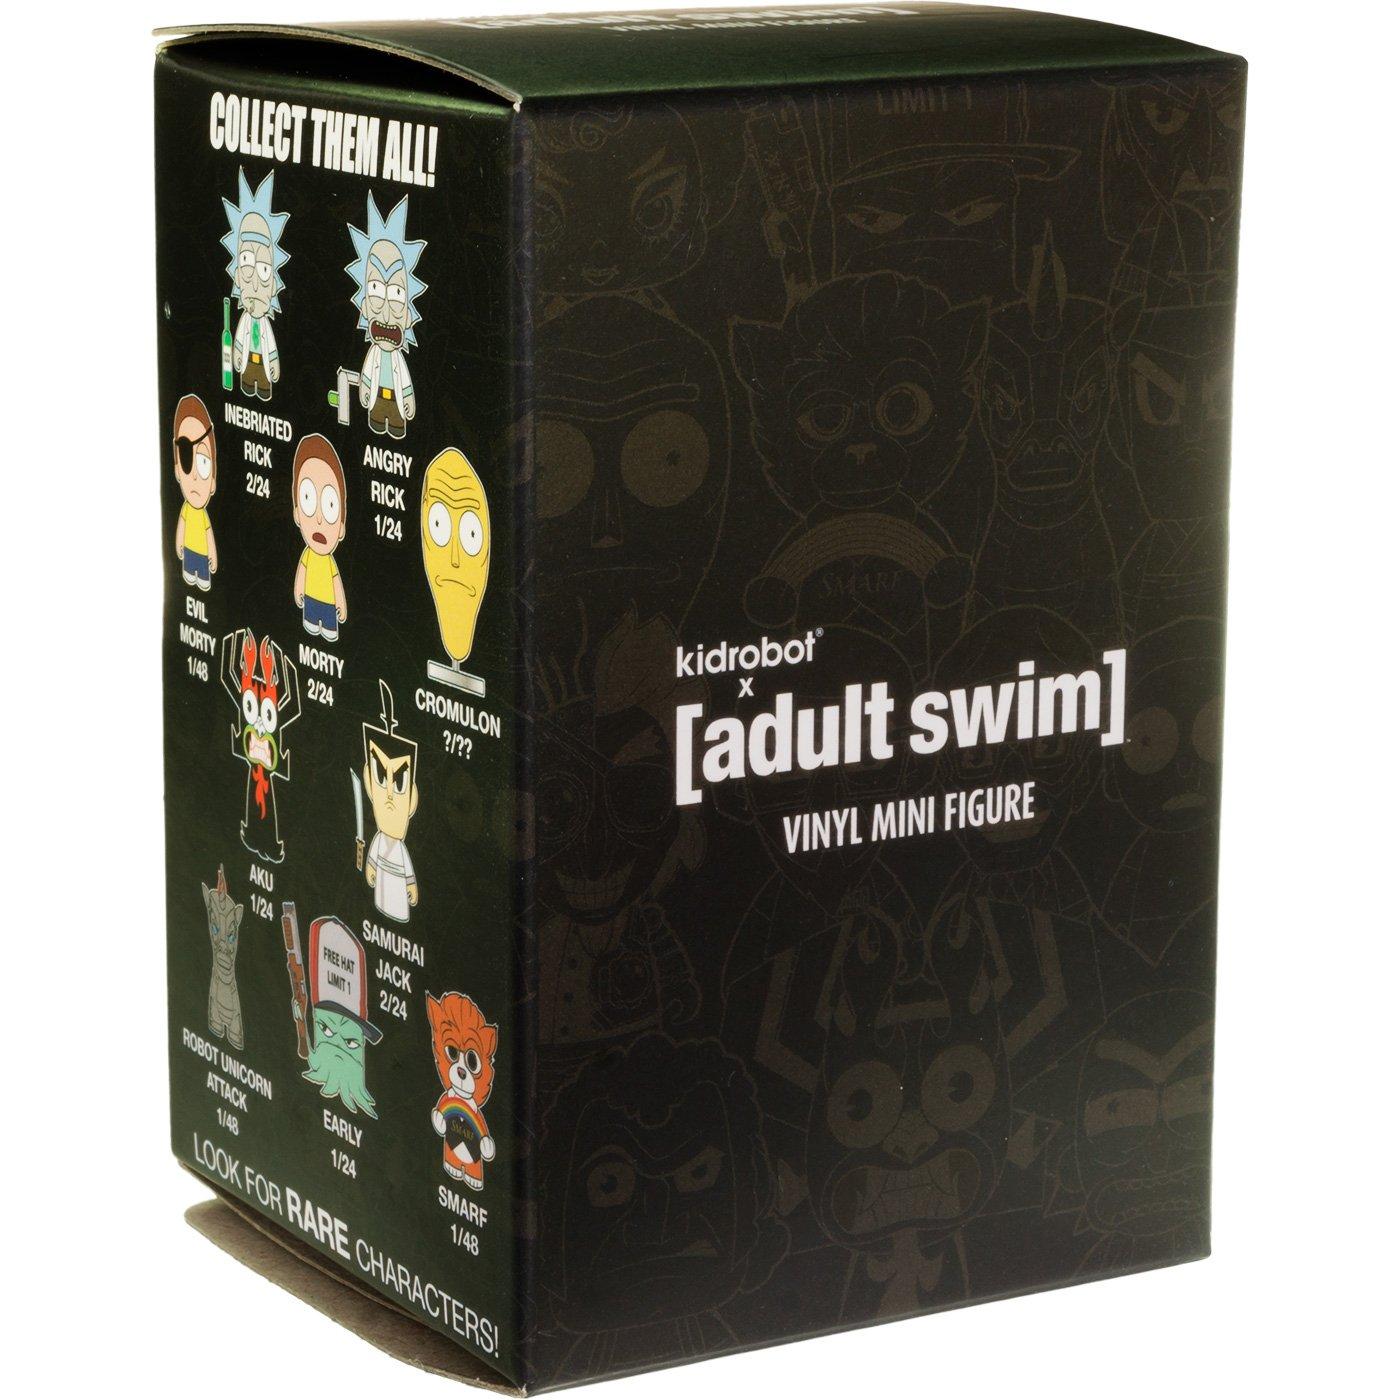 BCC9448006 Smarf RARE : ~2.9 Kidrobot x Adult Swim Mini Figure Too Many Cooks